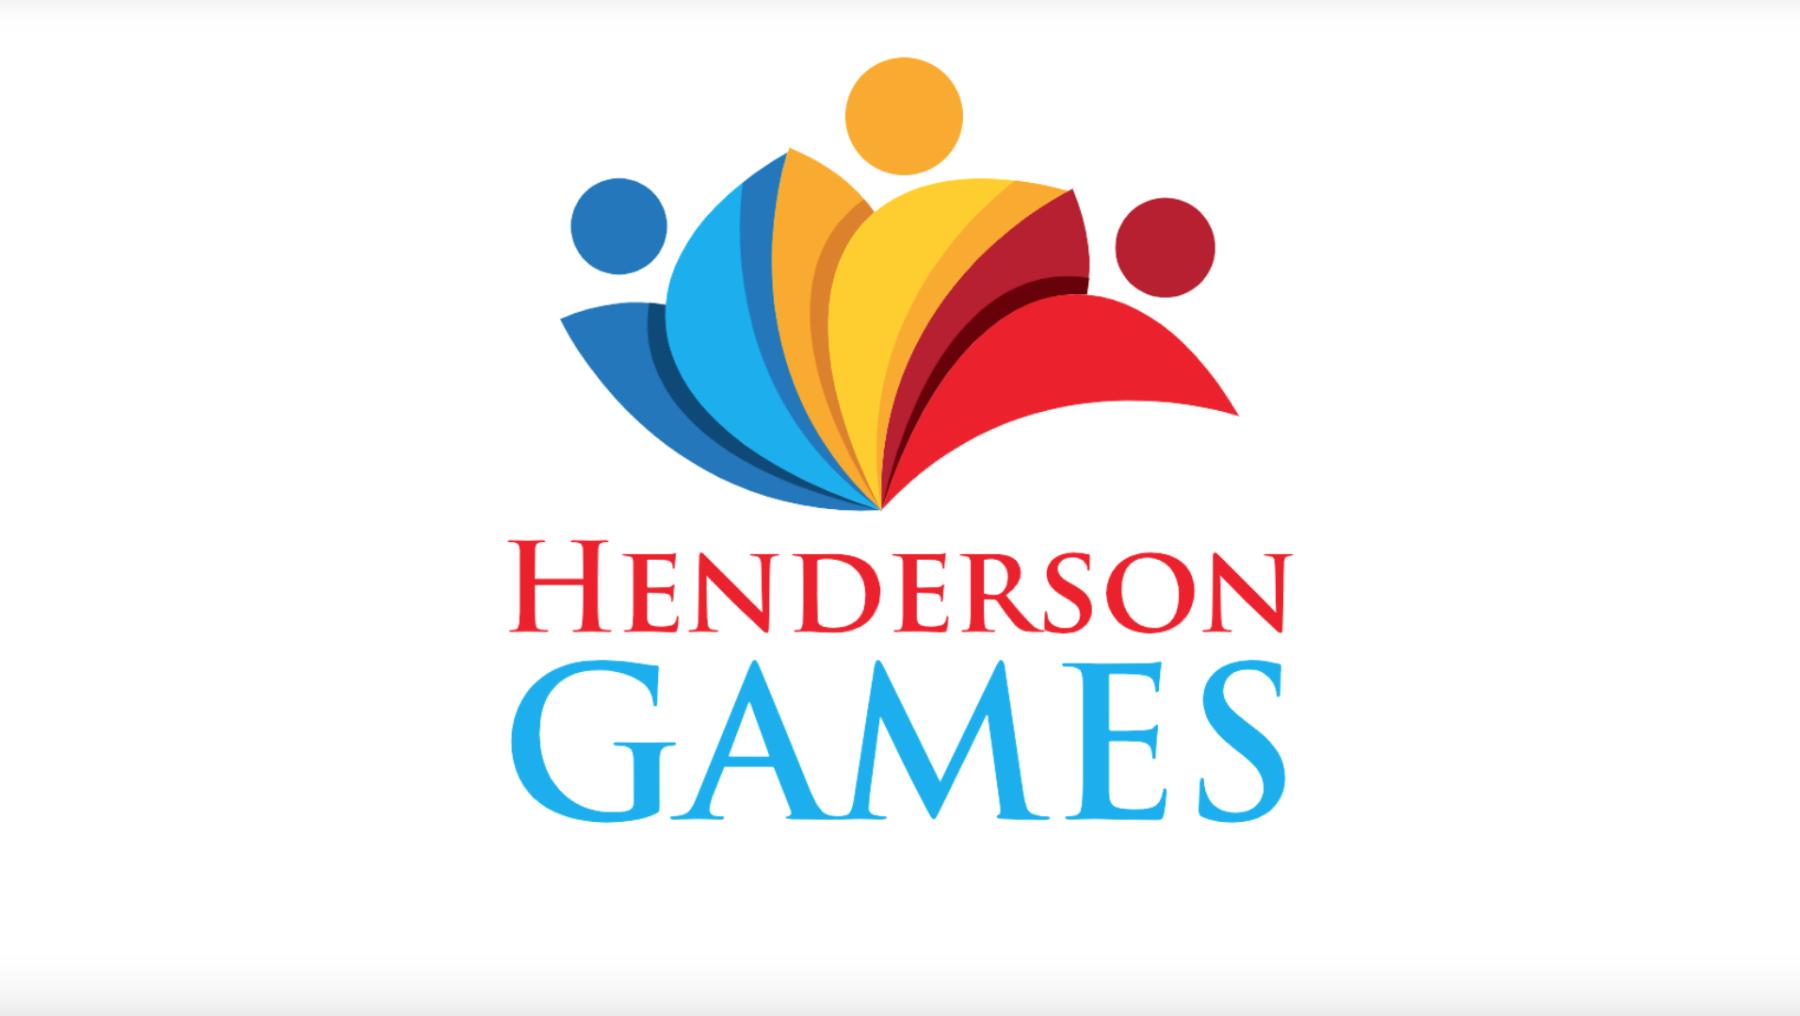 Henderson Games logo